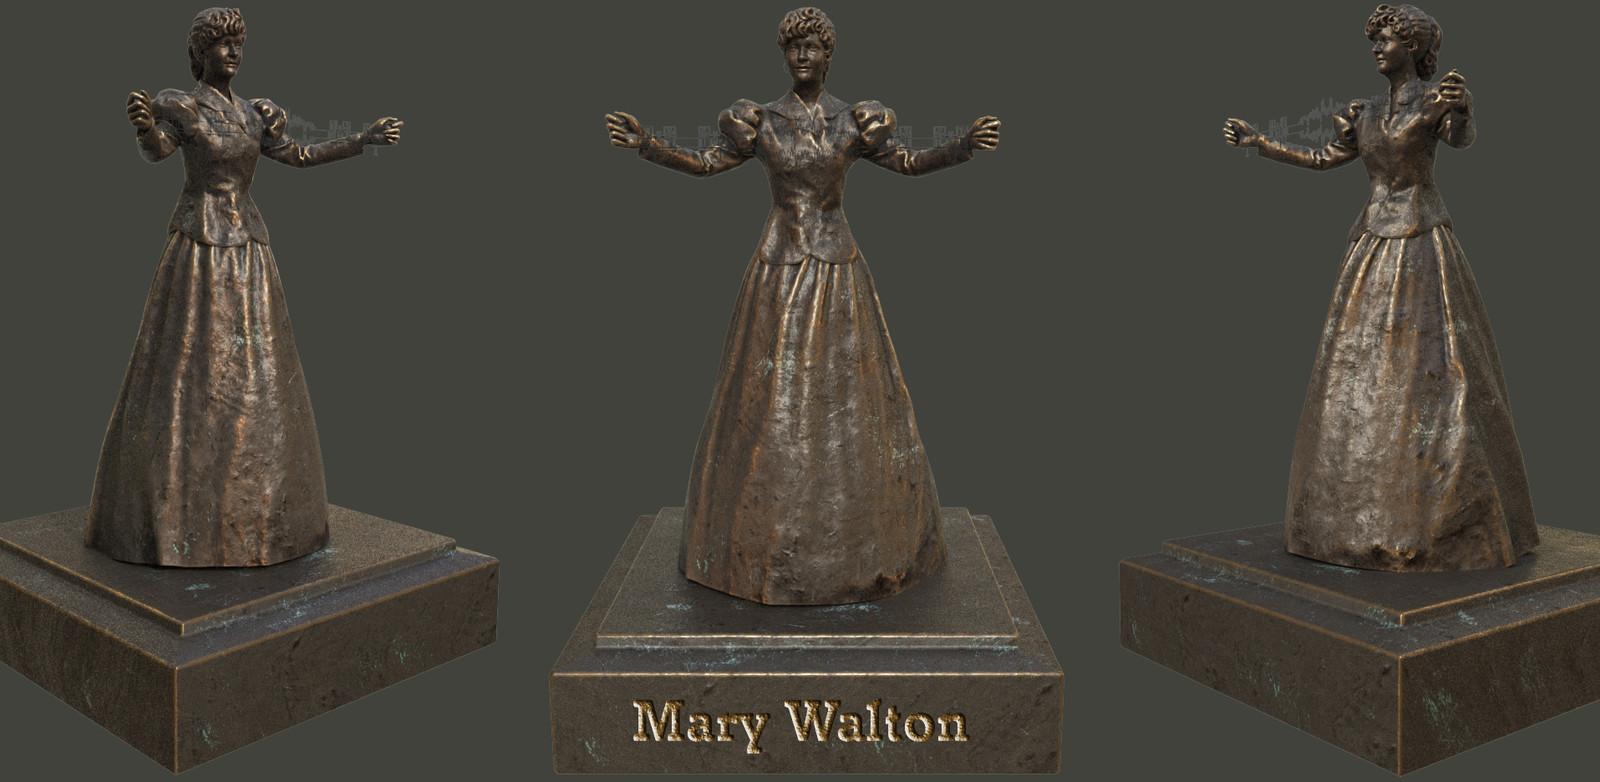 Mary Walton, inventor & engineer.